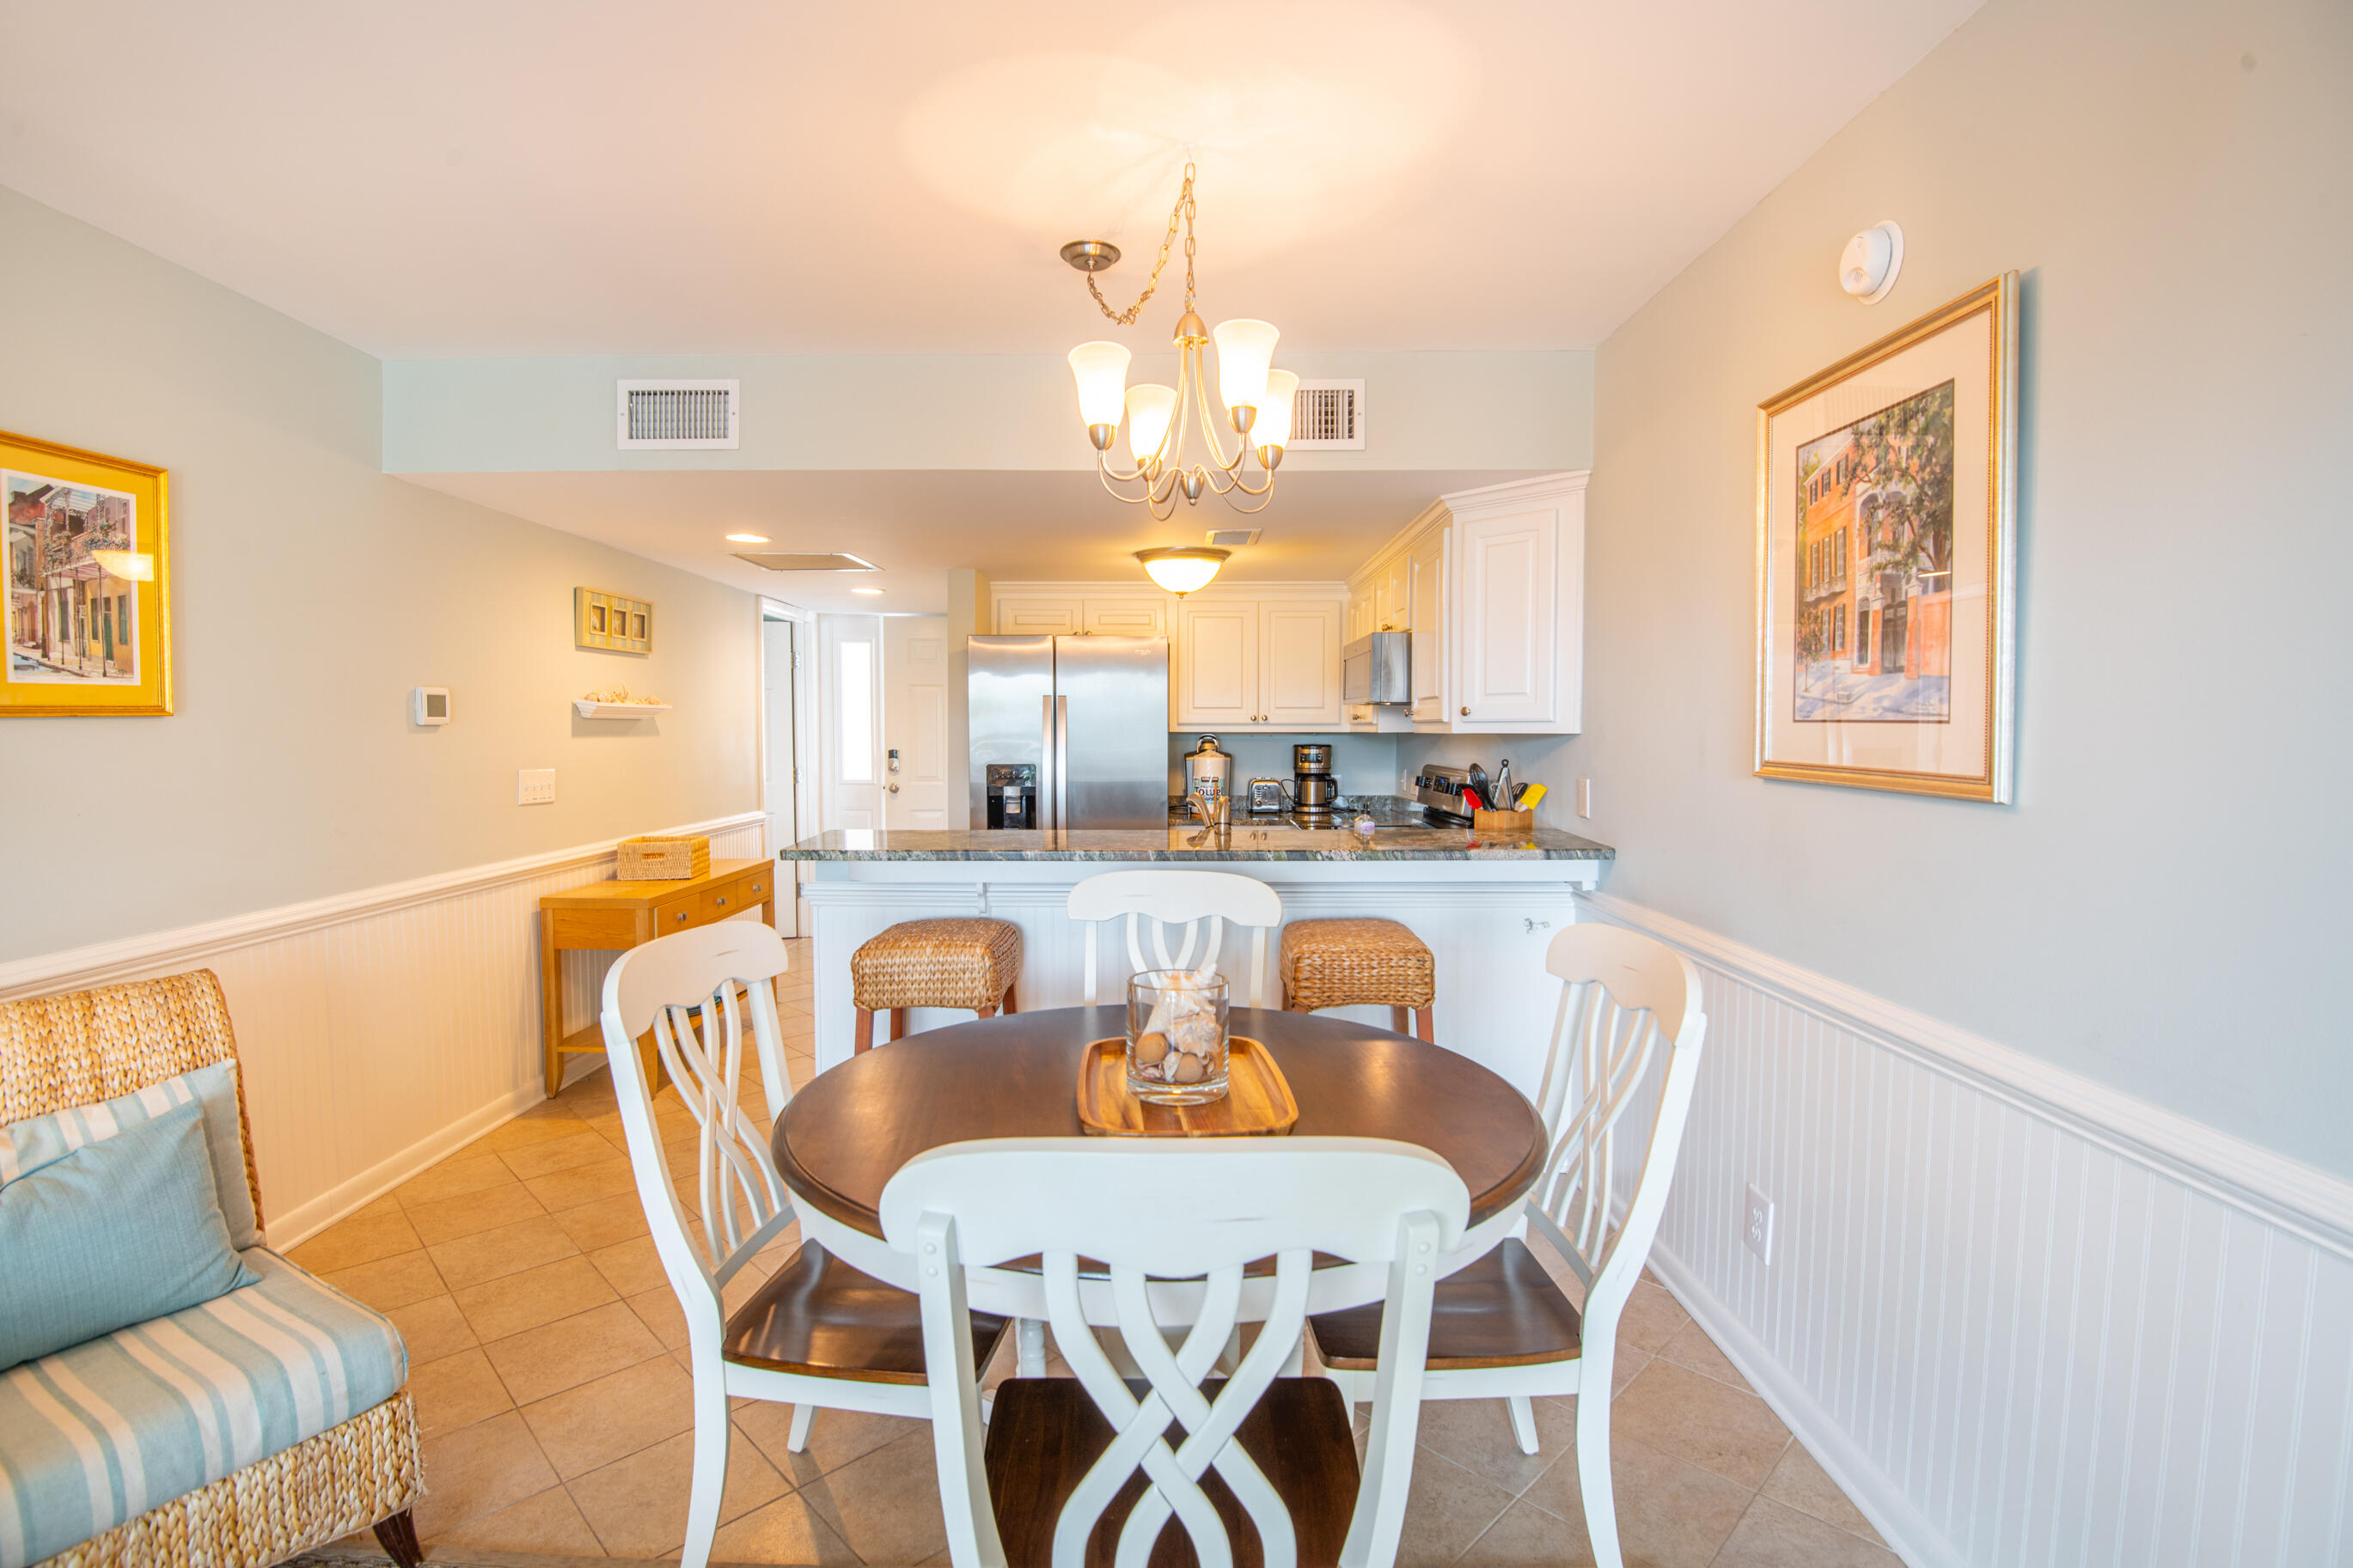 Atrium Villas Homes For Sale - 2935 Atrium Villa, Seabrook Island, SC - 38